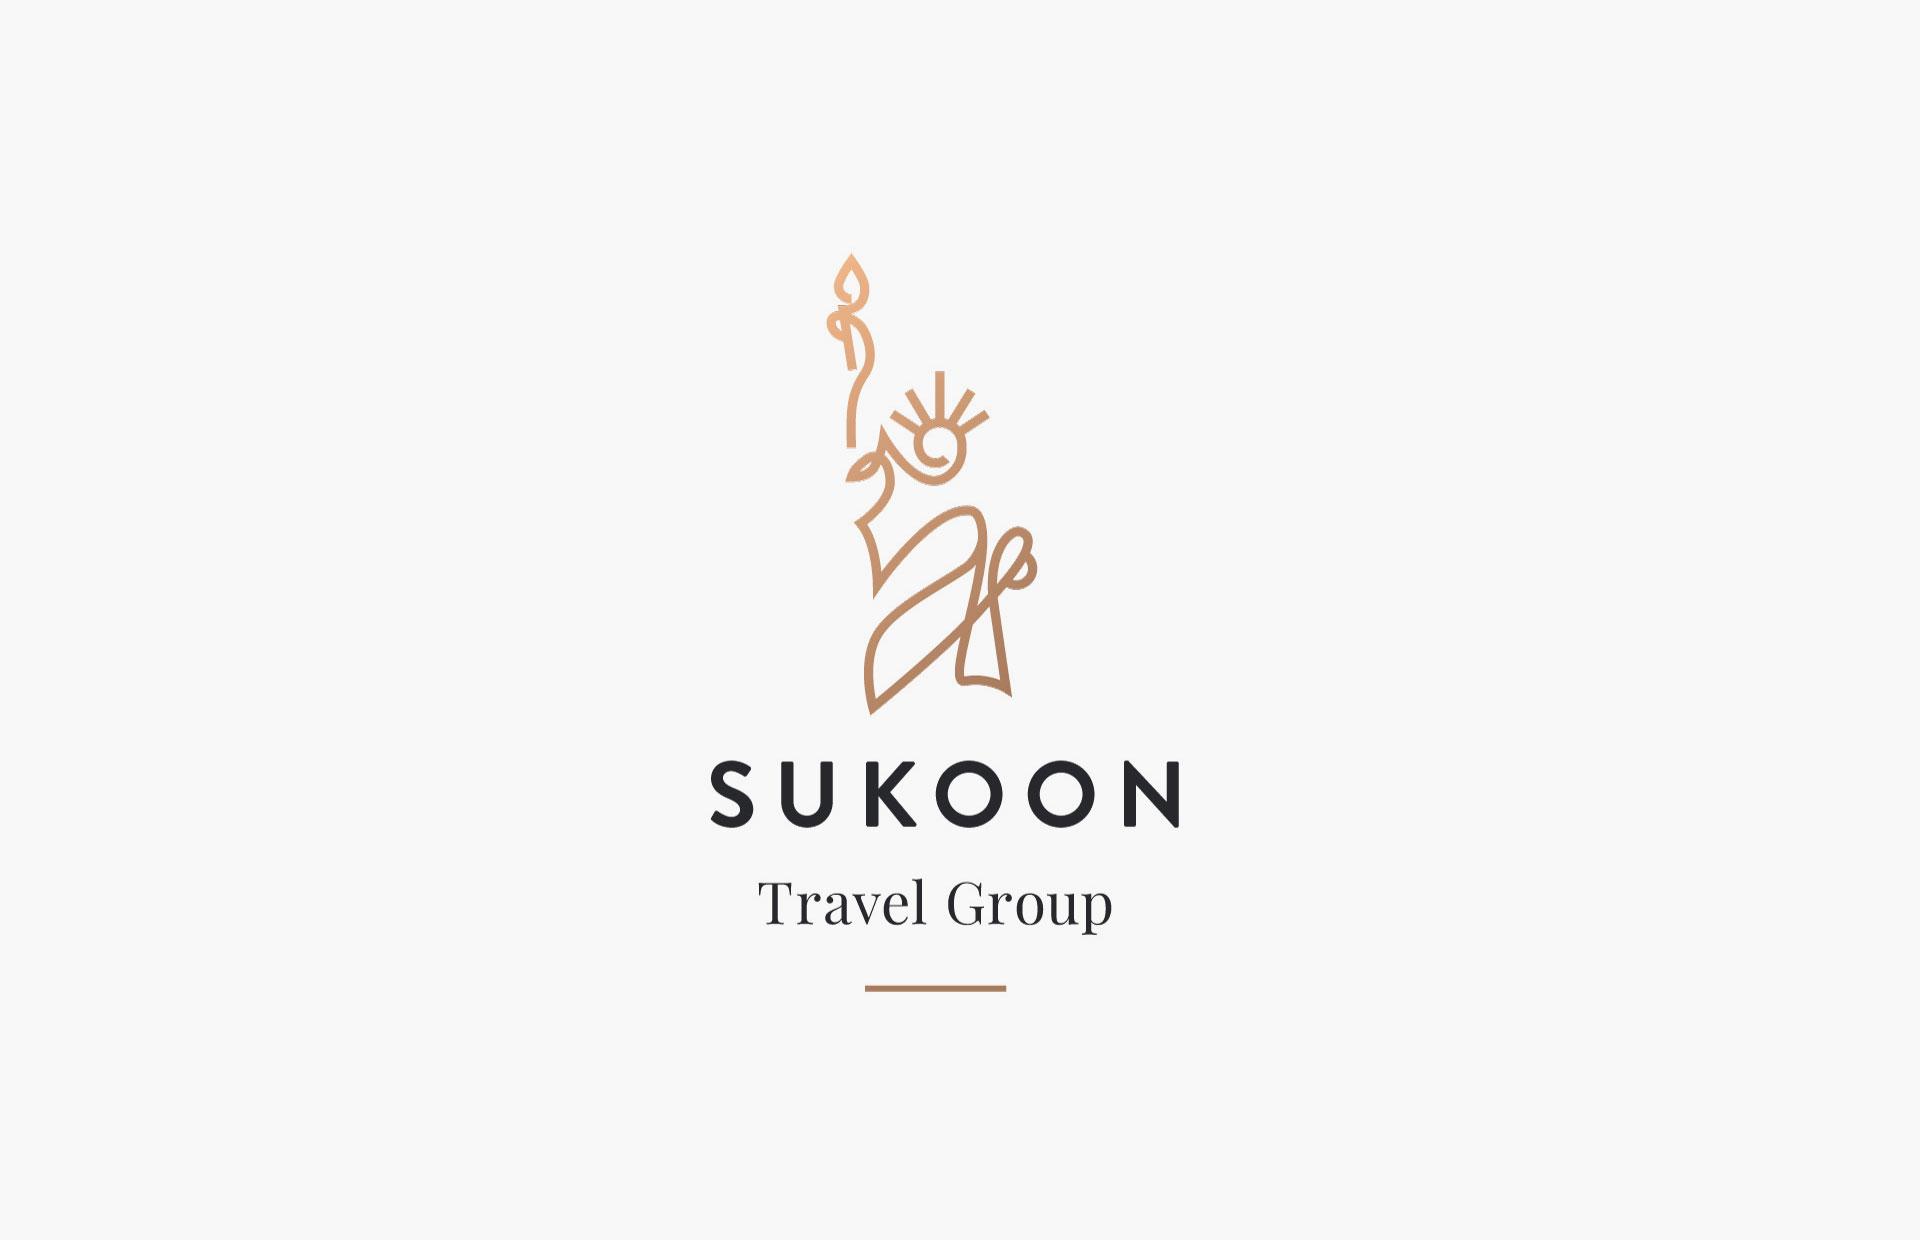 Sukoon logo execution